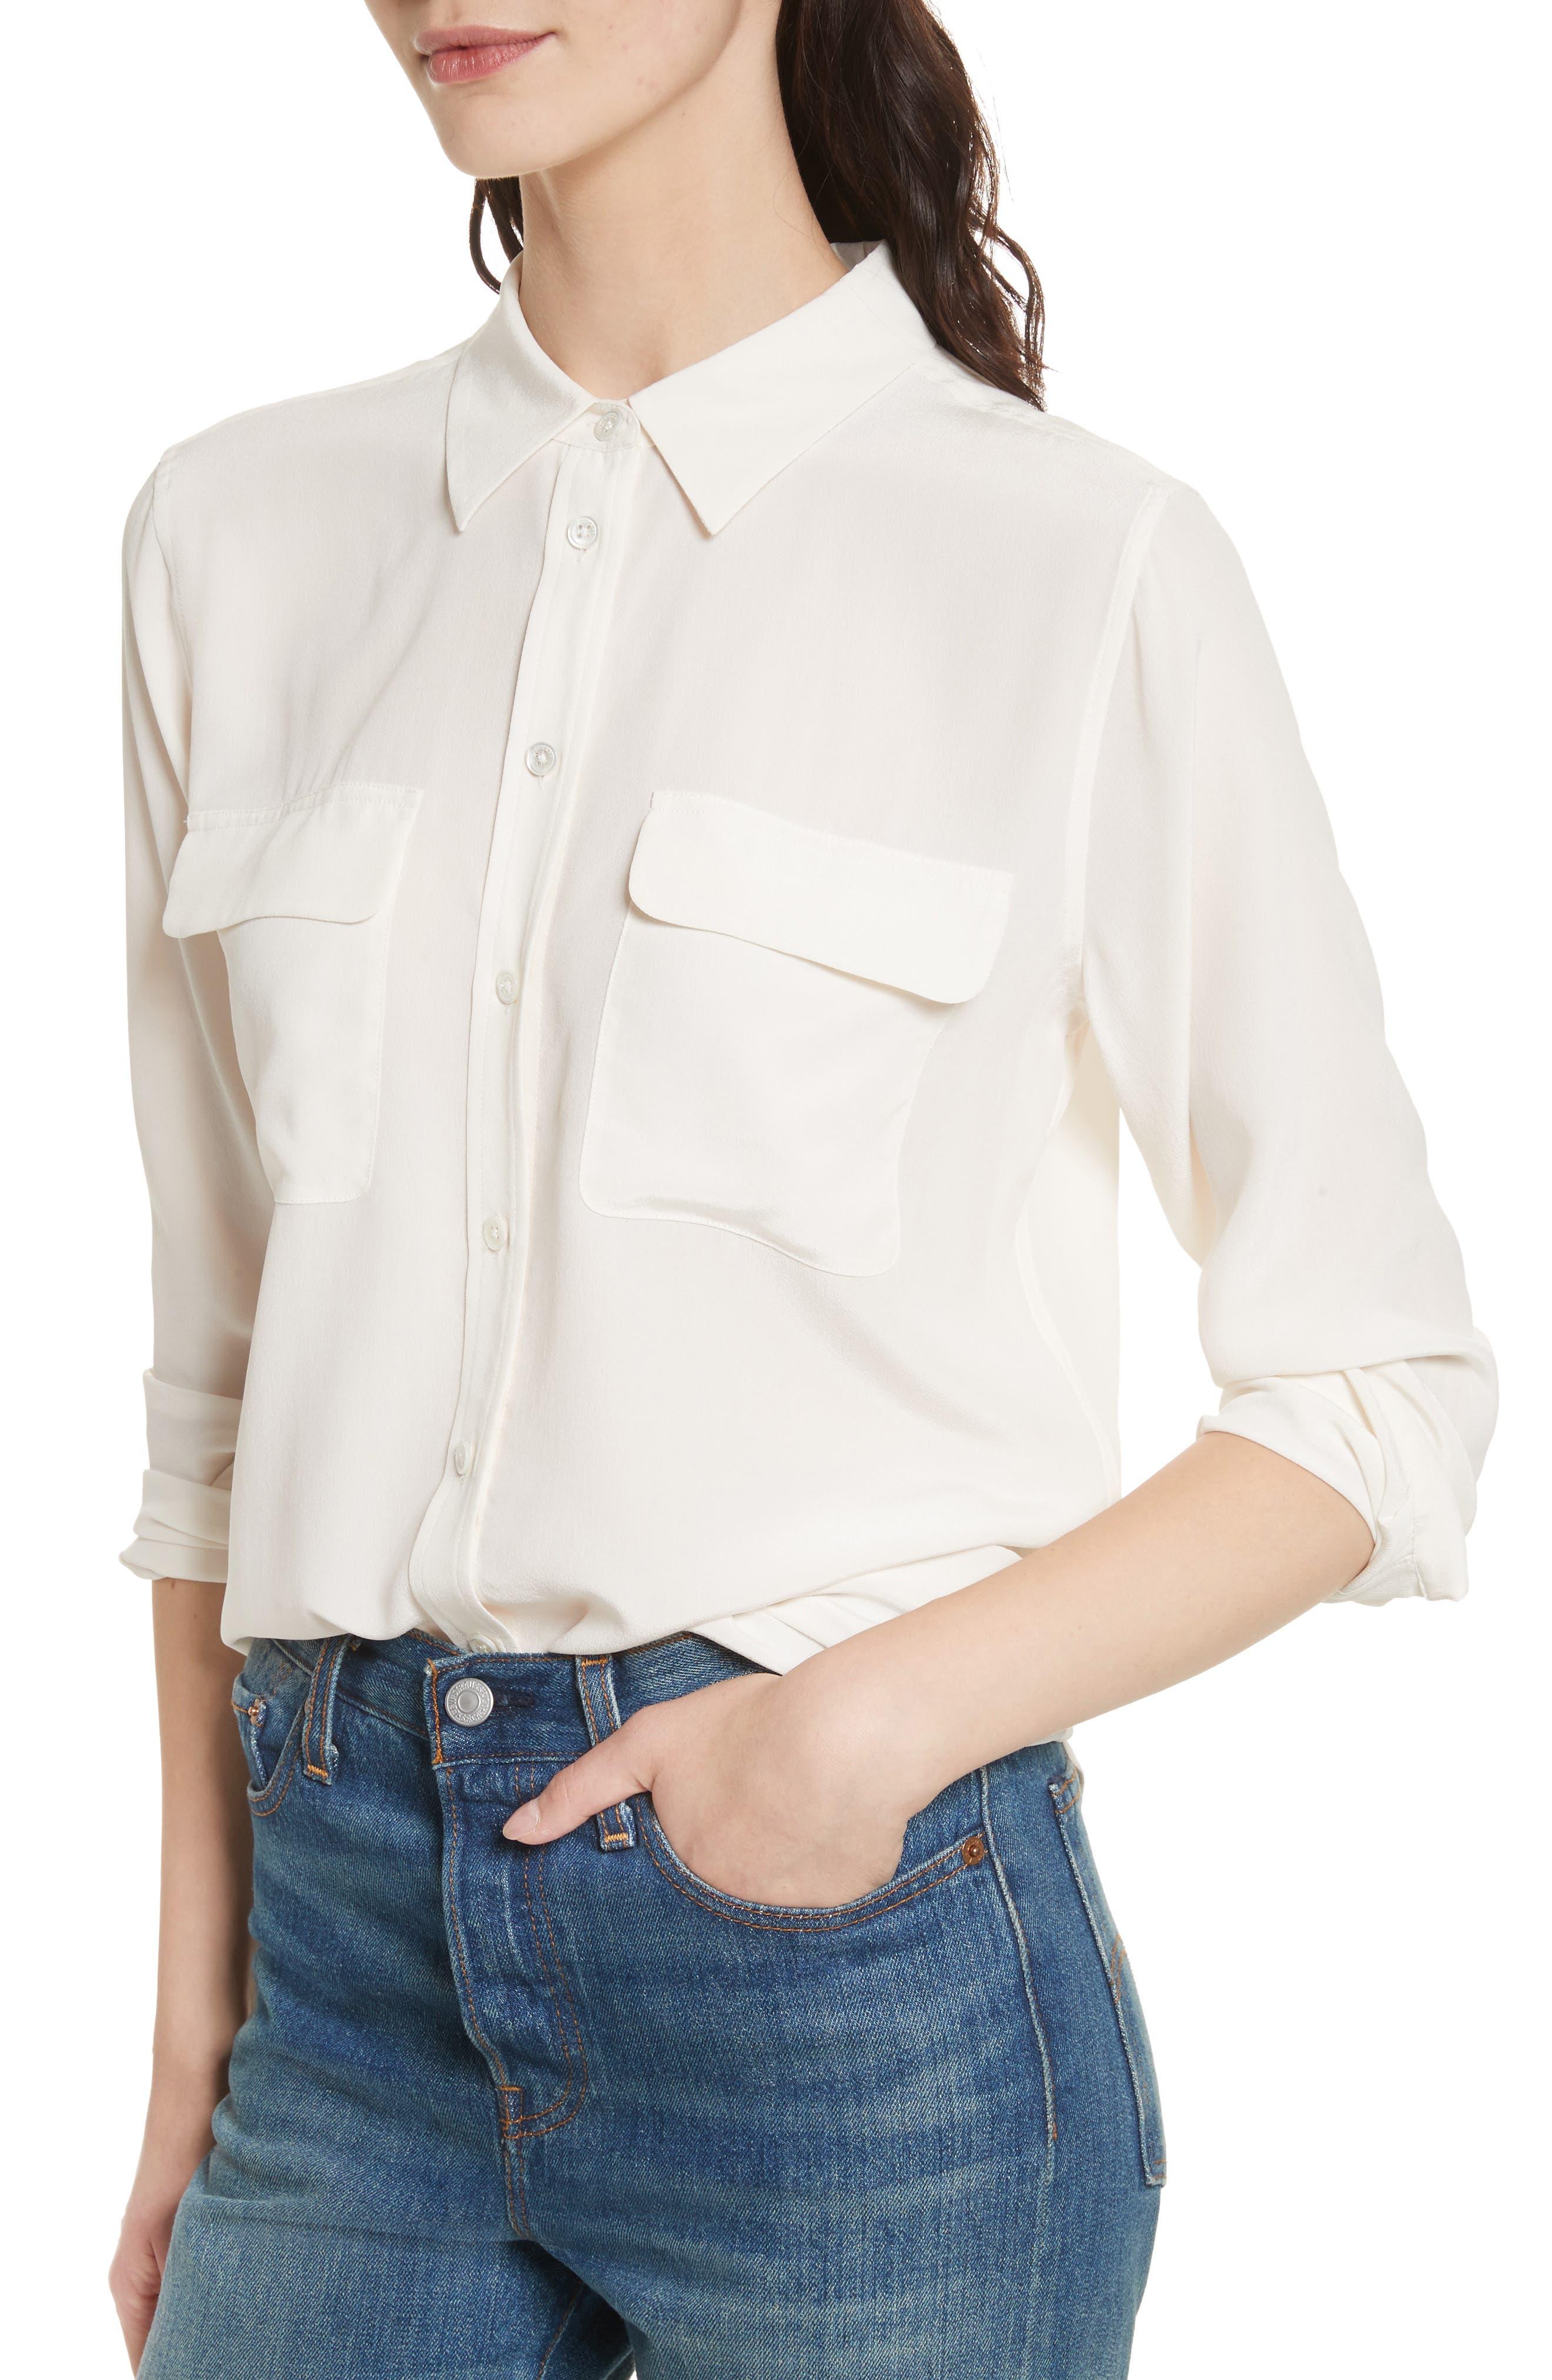 EQUIPMENT,                             'Slim Signature' Silk Shirt,                             Alternate thumbnail 4, color,                             BRIGHT WHITE